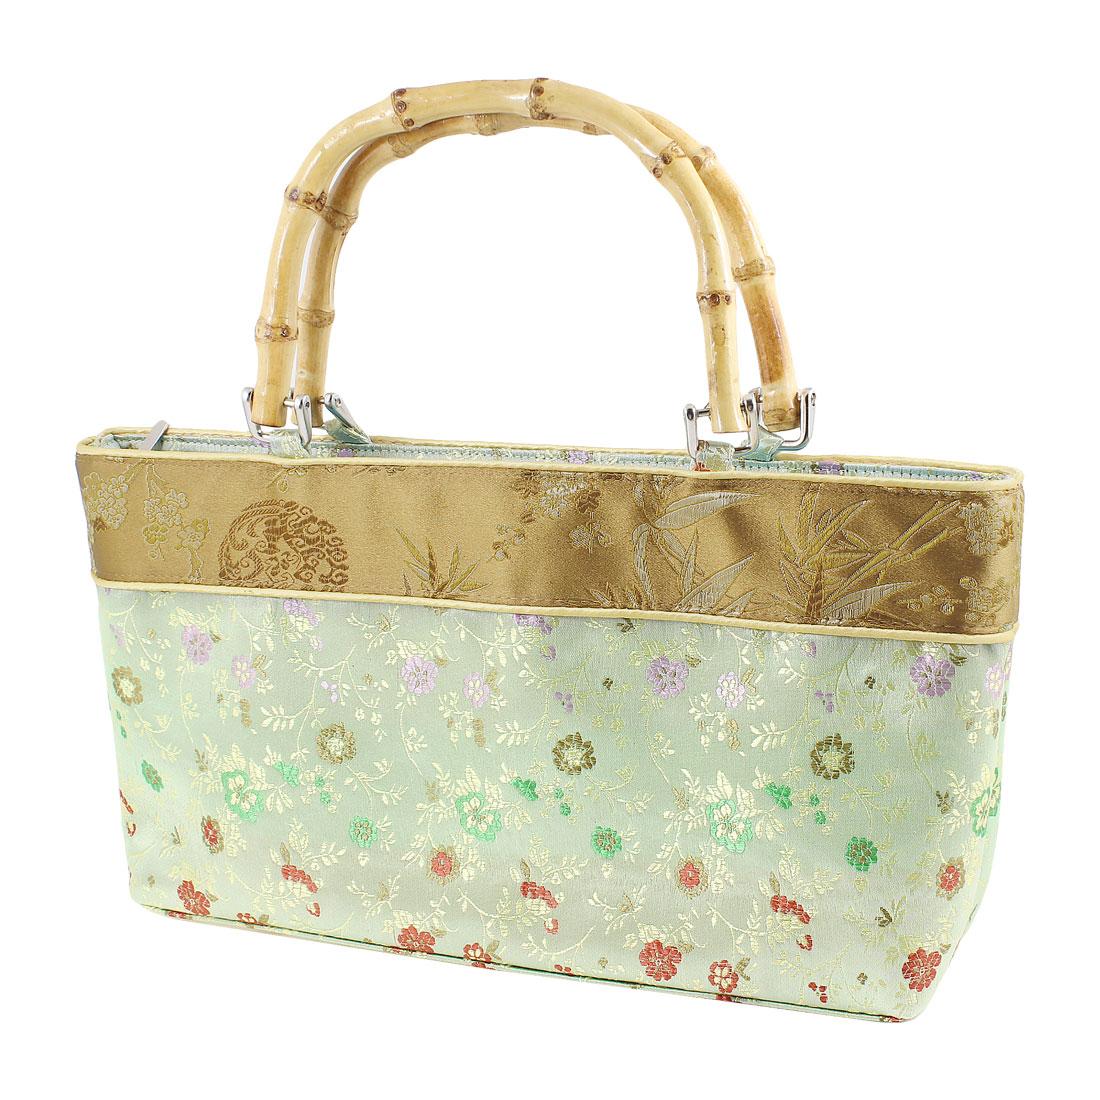 Women-Portable-Bamboo-Handle-Embroider-Plum-Blossom-Print-Handbag